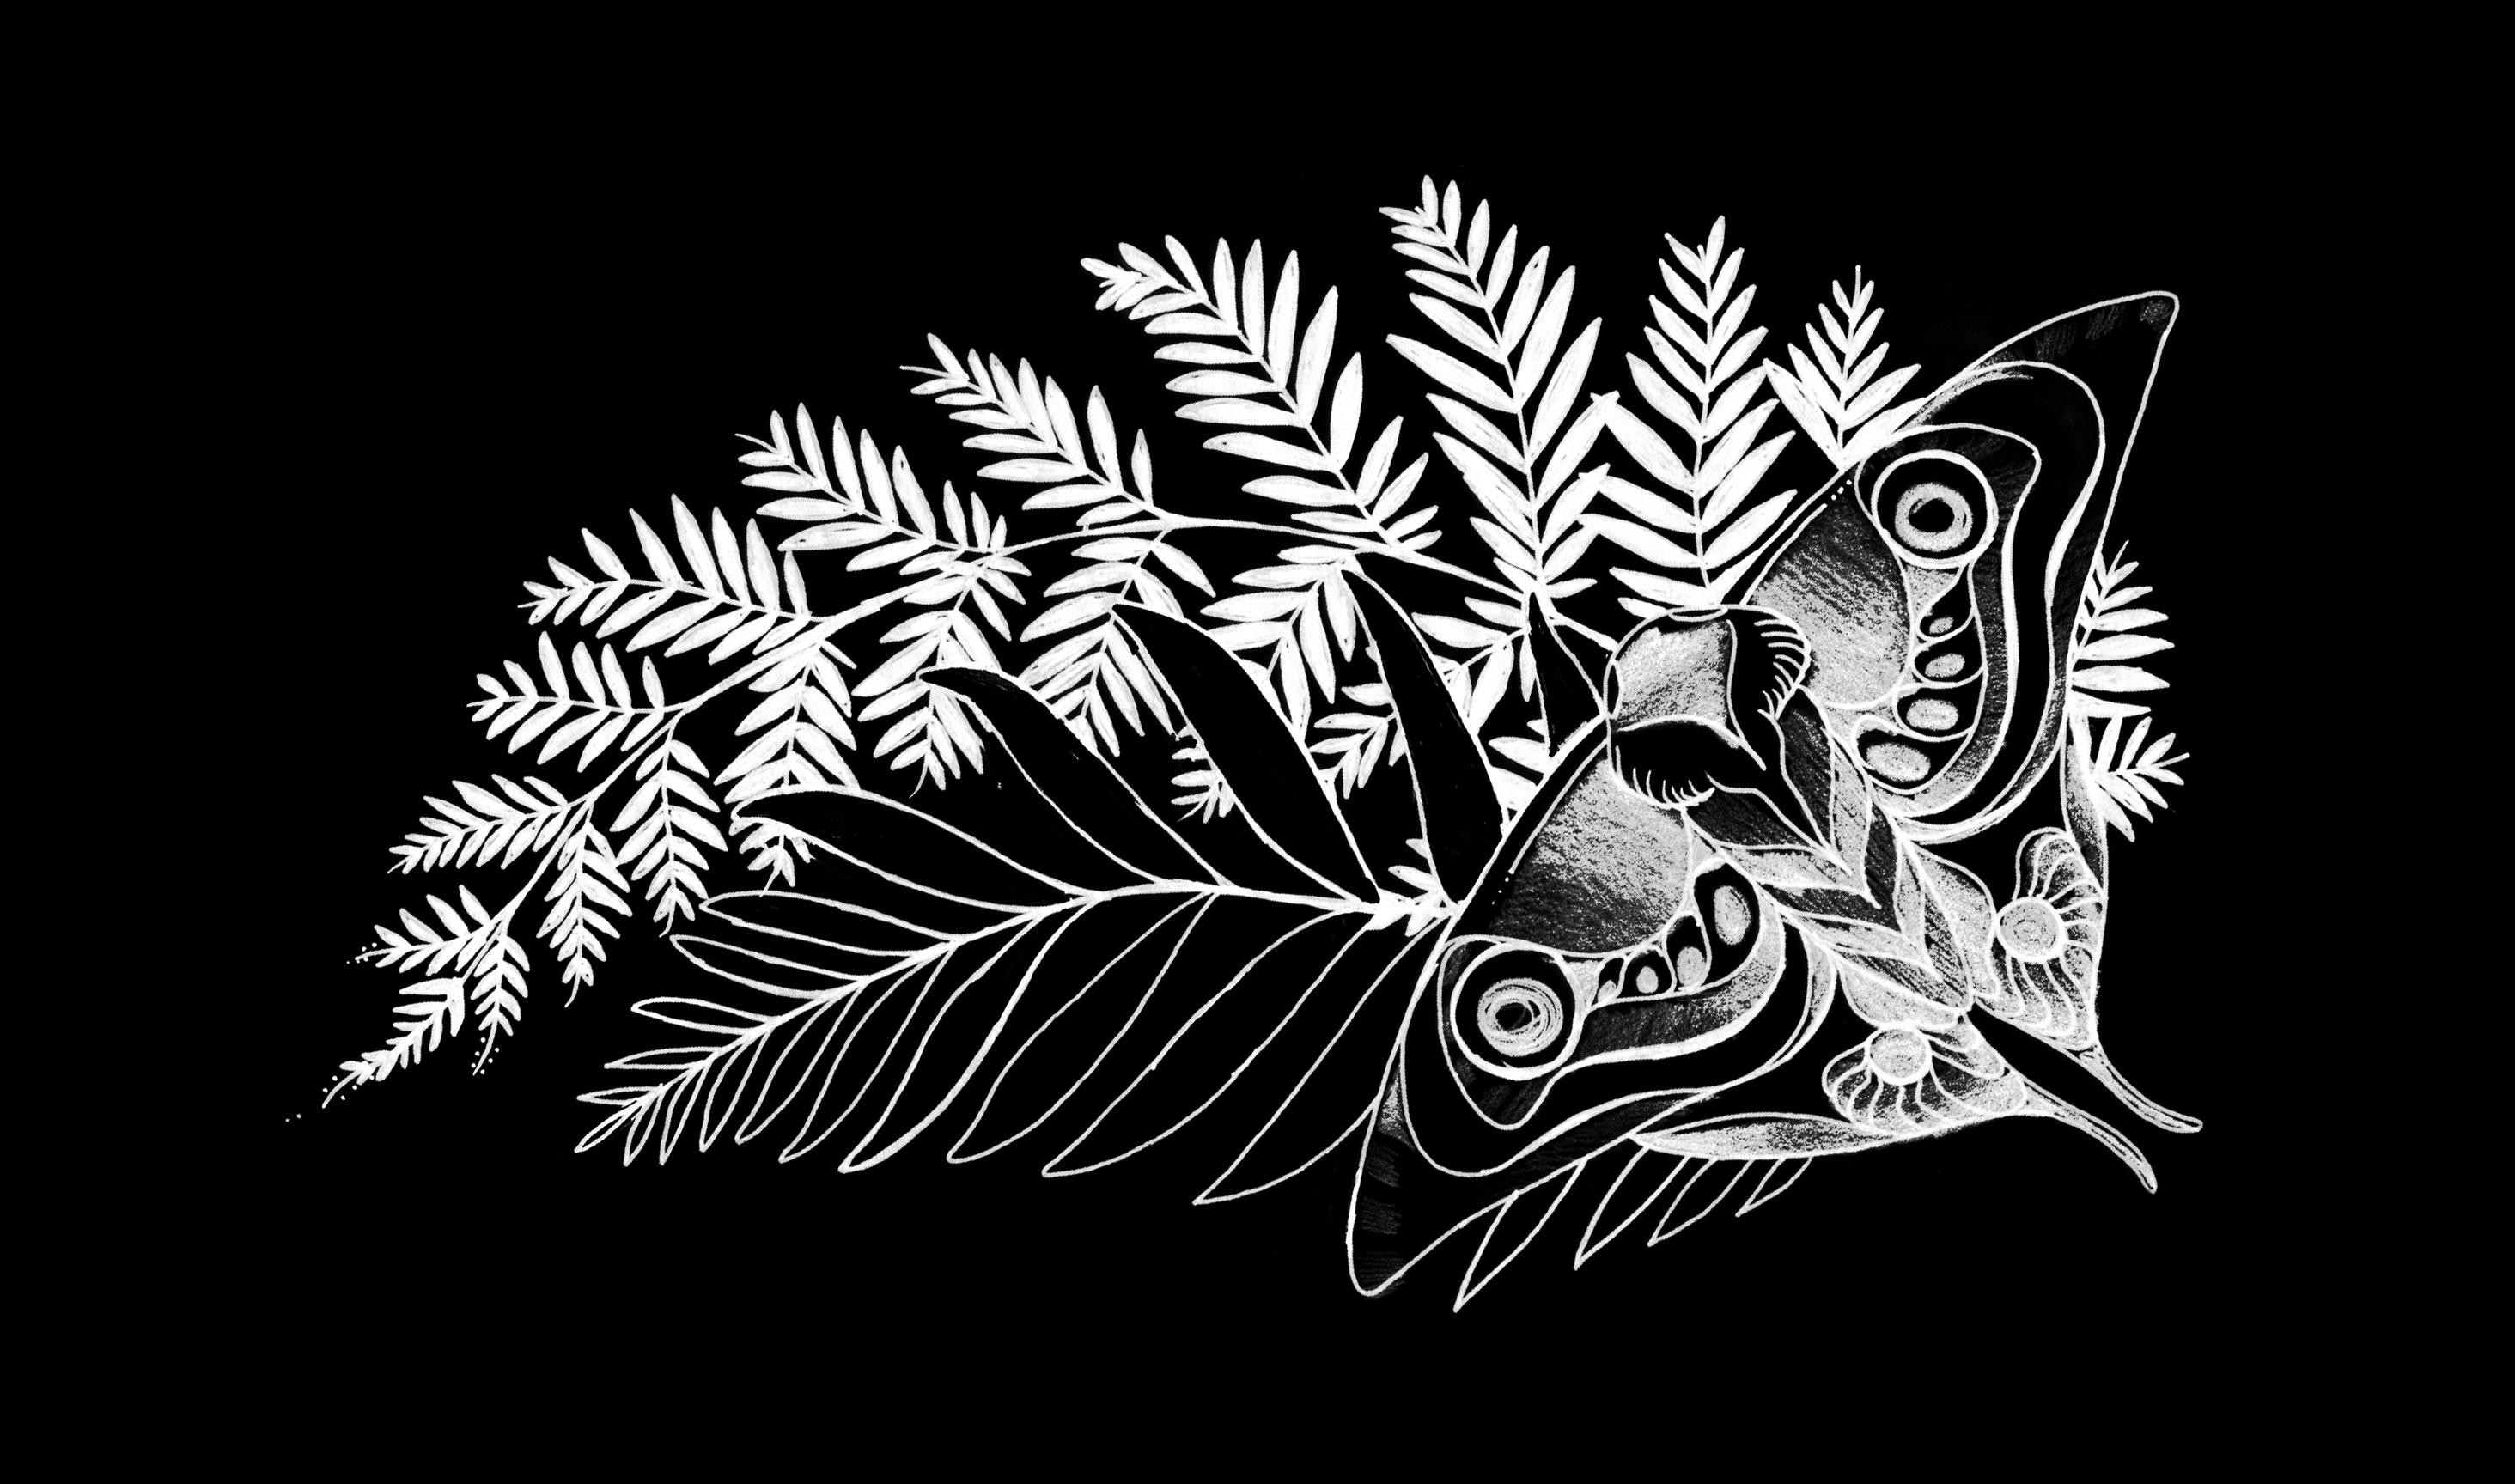 Imageellie Tattoo Wallpaper In Black   Data-src /w/full/d/2/6/543438 - The Last Of Us , HD Wallpaper & Backgrounds